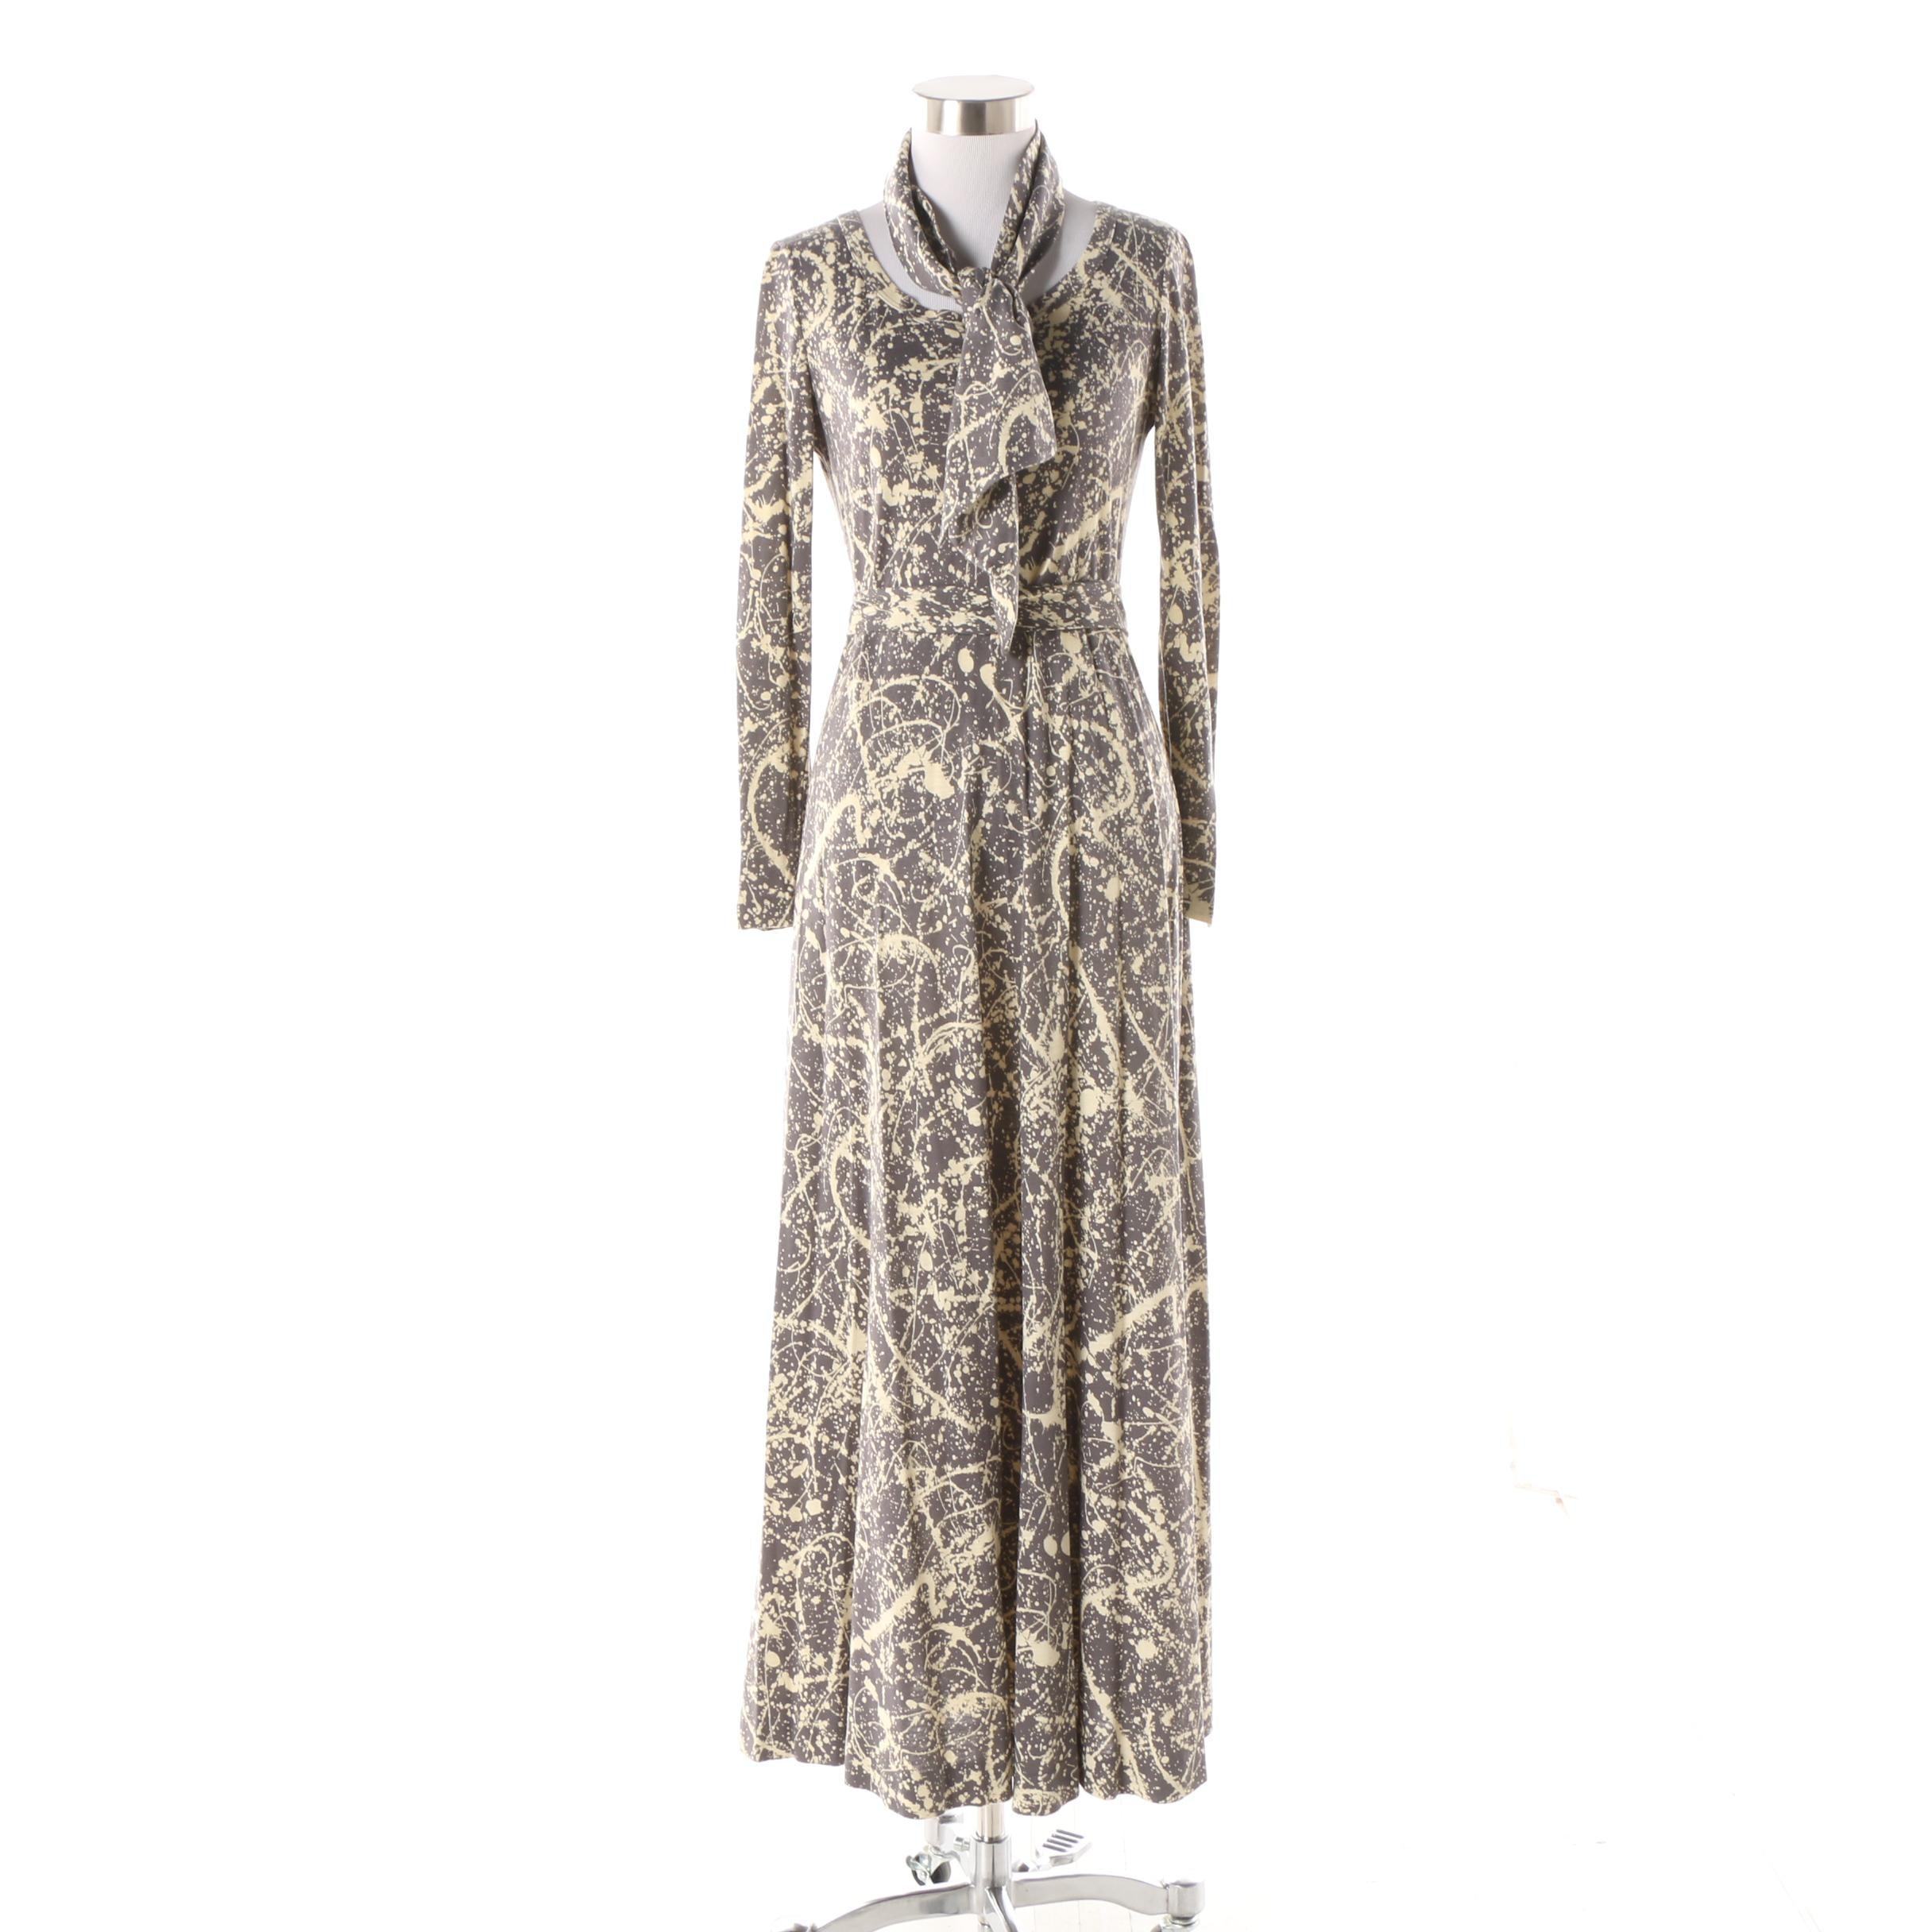 1970s Diane von Furstenberg Jackson Pollock-Inspired Paint Splatter Print Dress